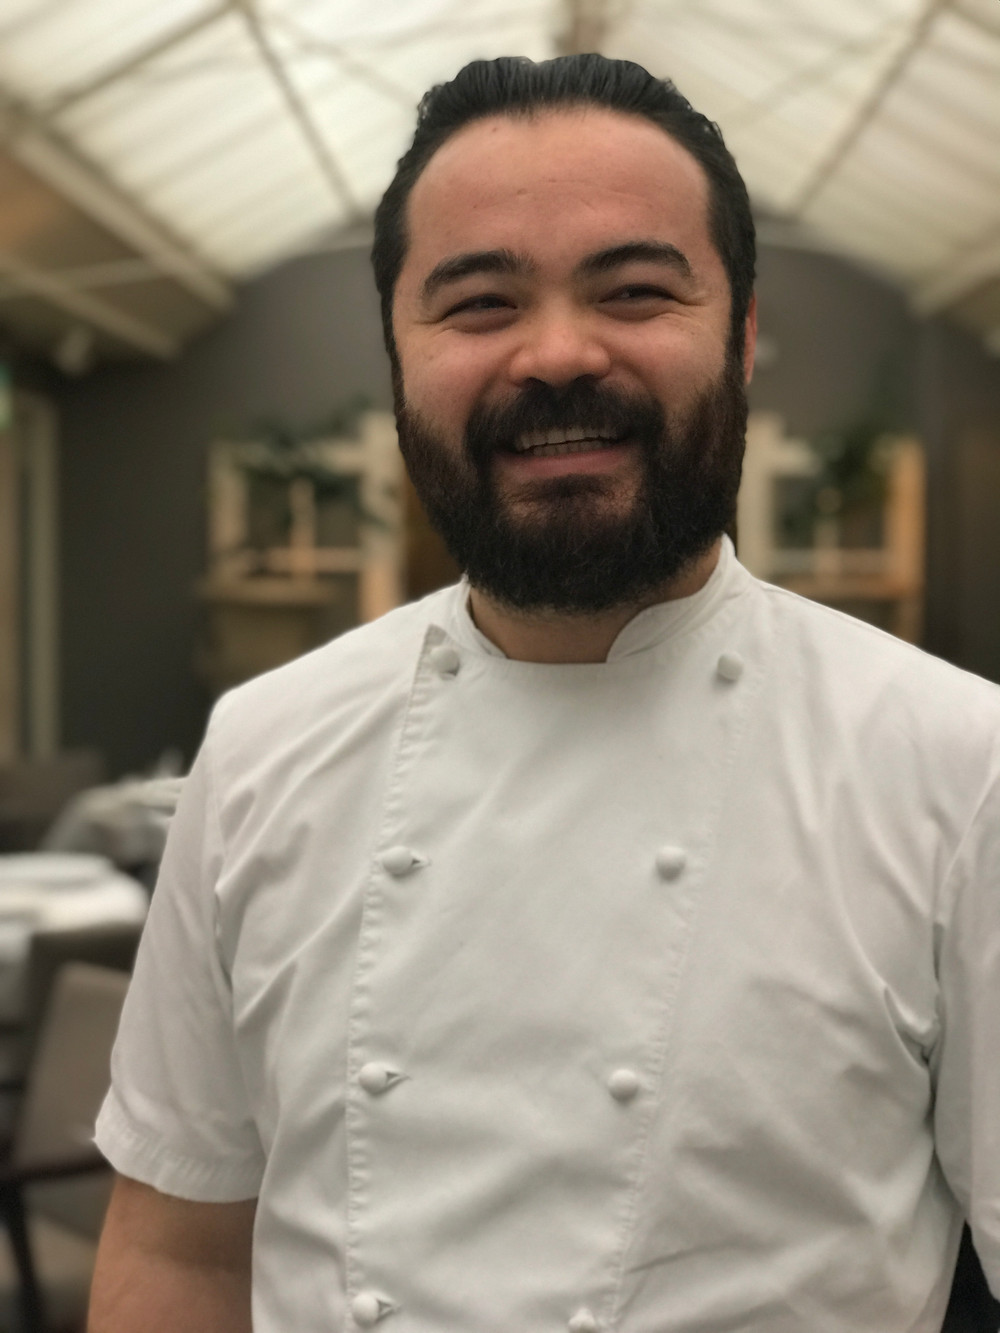 Luke Phillips, Head Chef, Hans' Bar & Grill